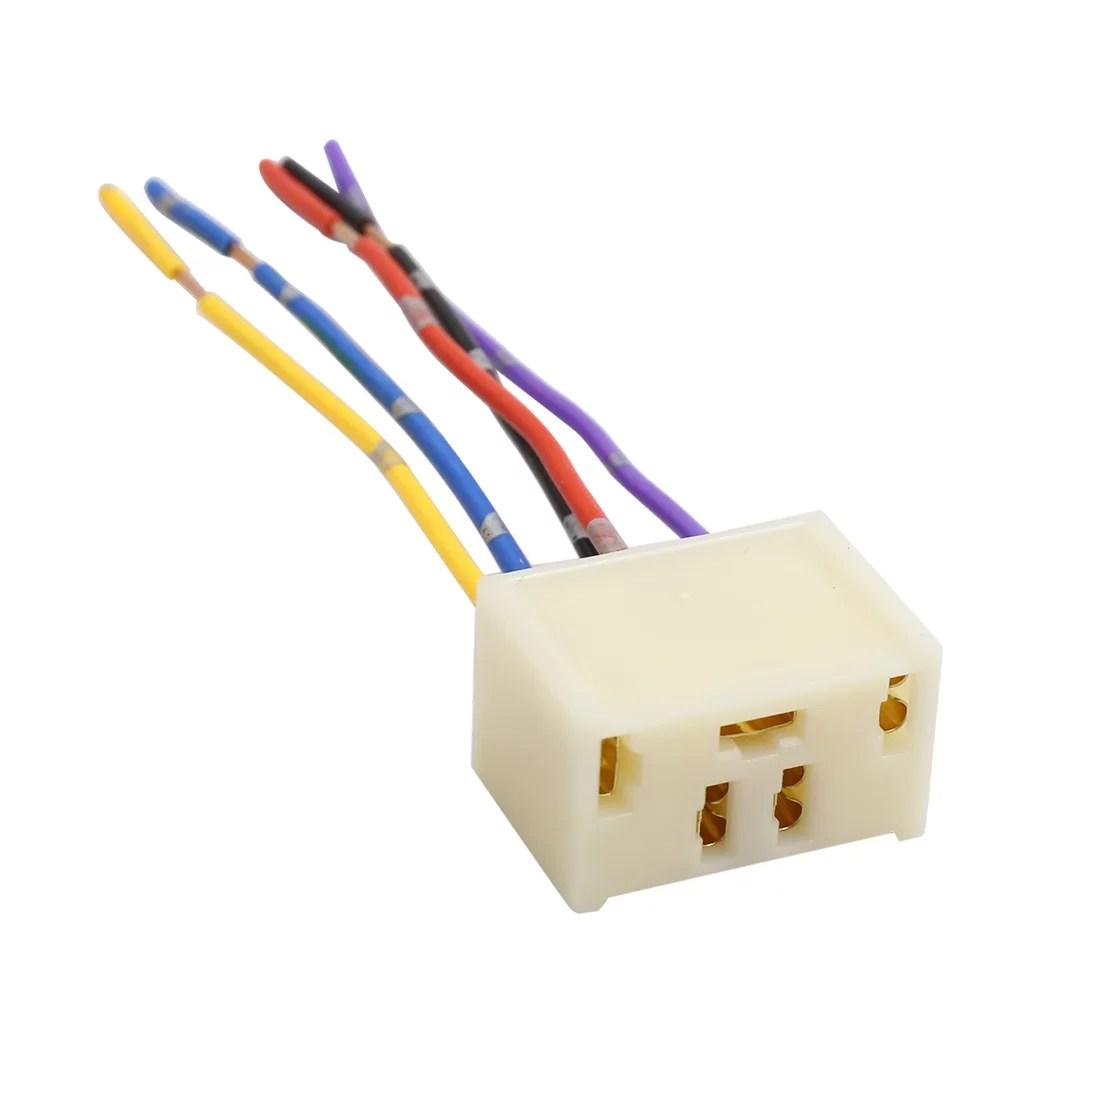 4pcs dc 12v 5 pin car power window switch socket wiring harness plug 3 wire harness repair window [ 1100 x 1100 Pixel ]